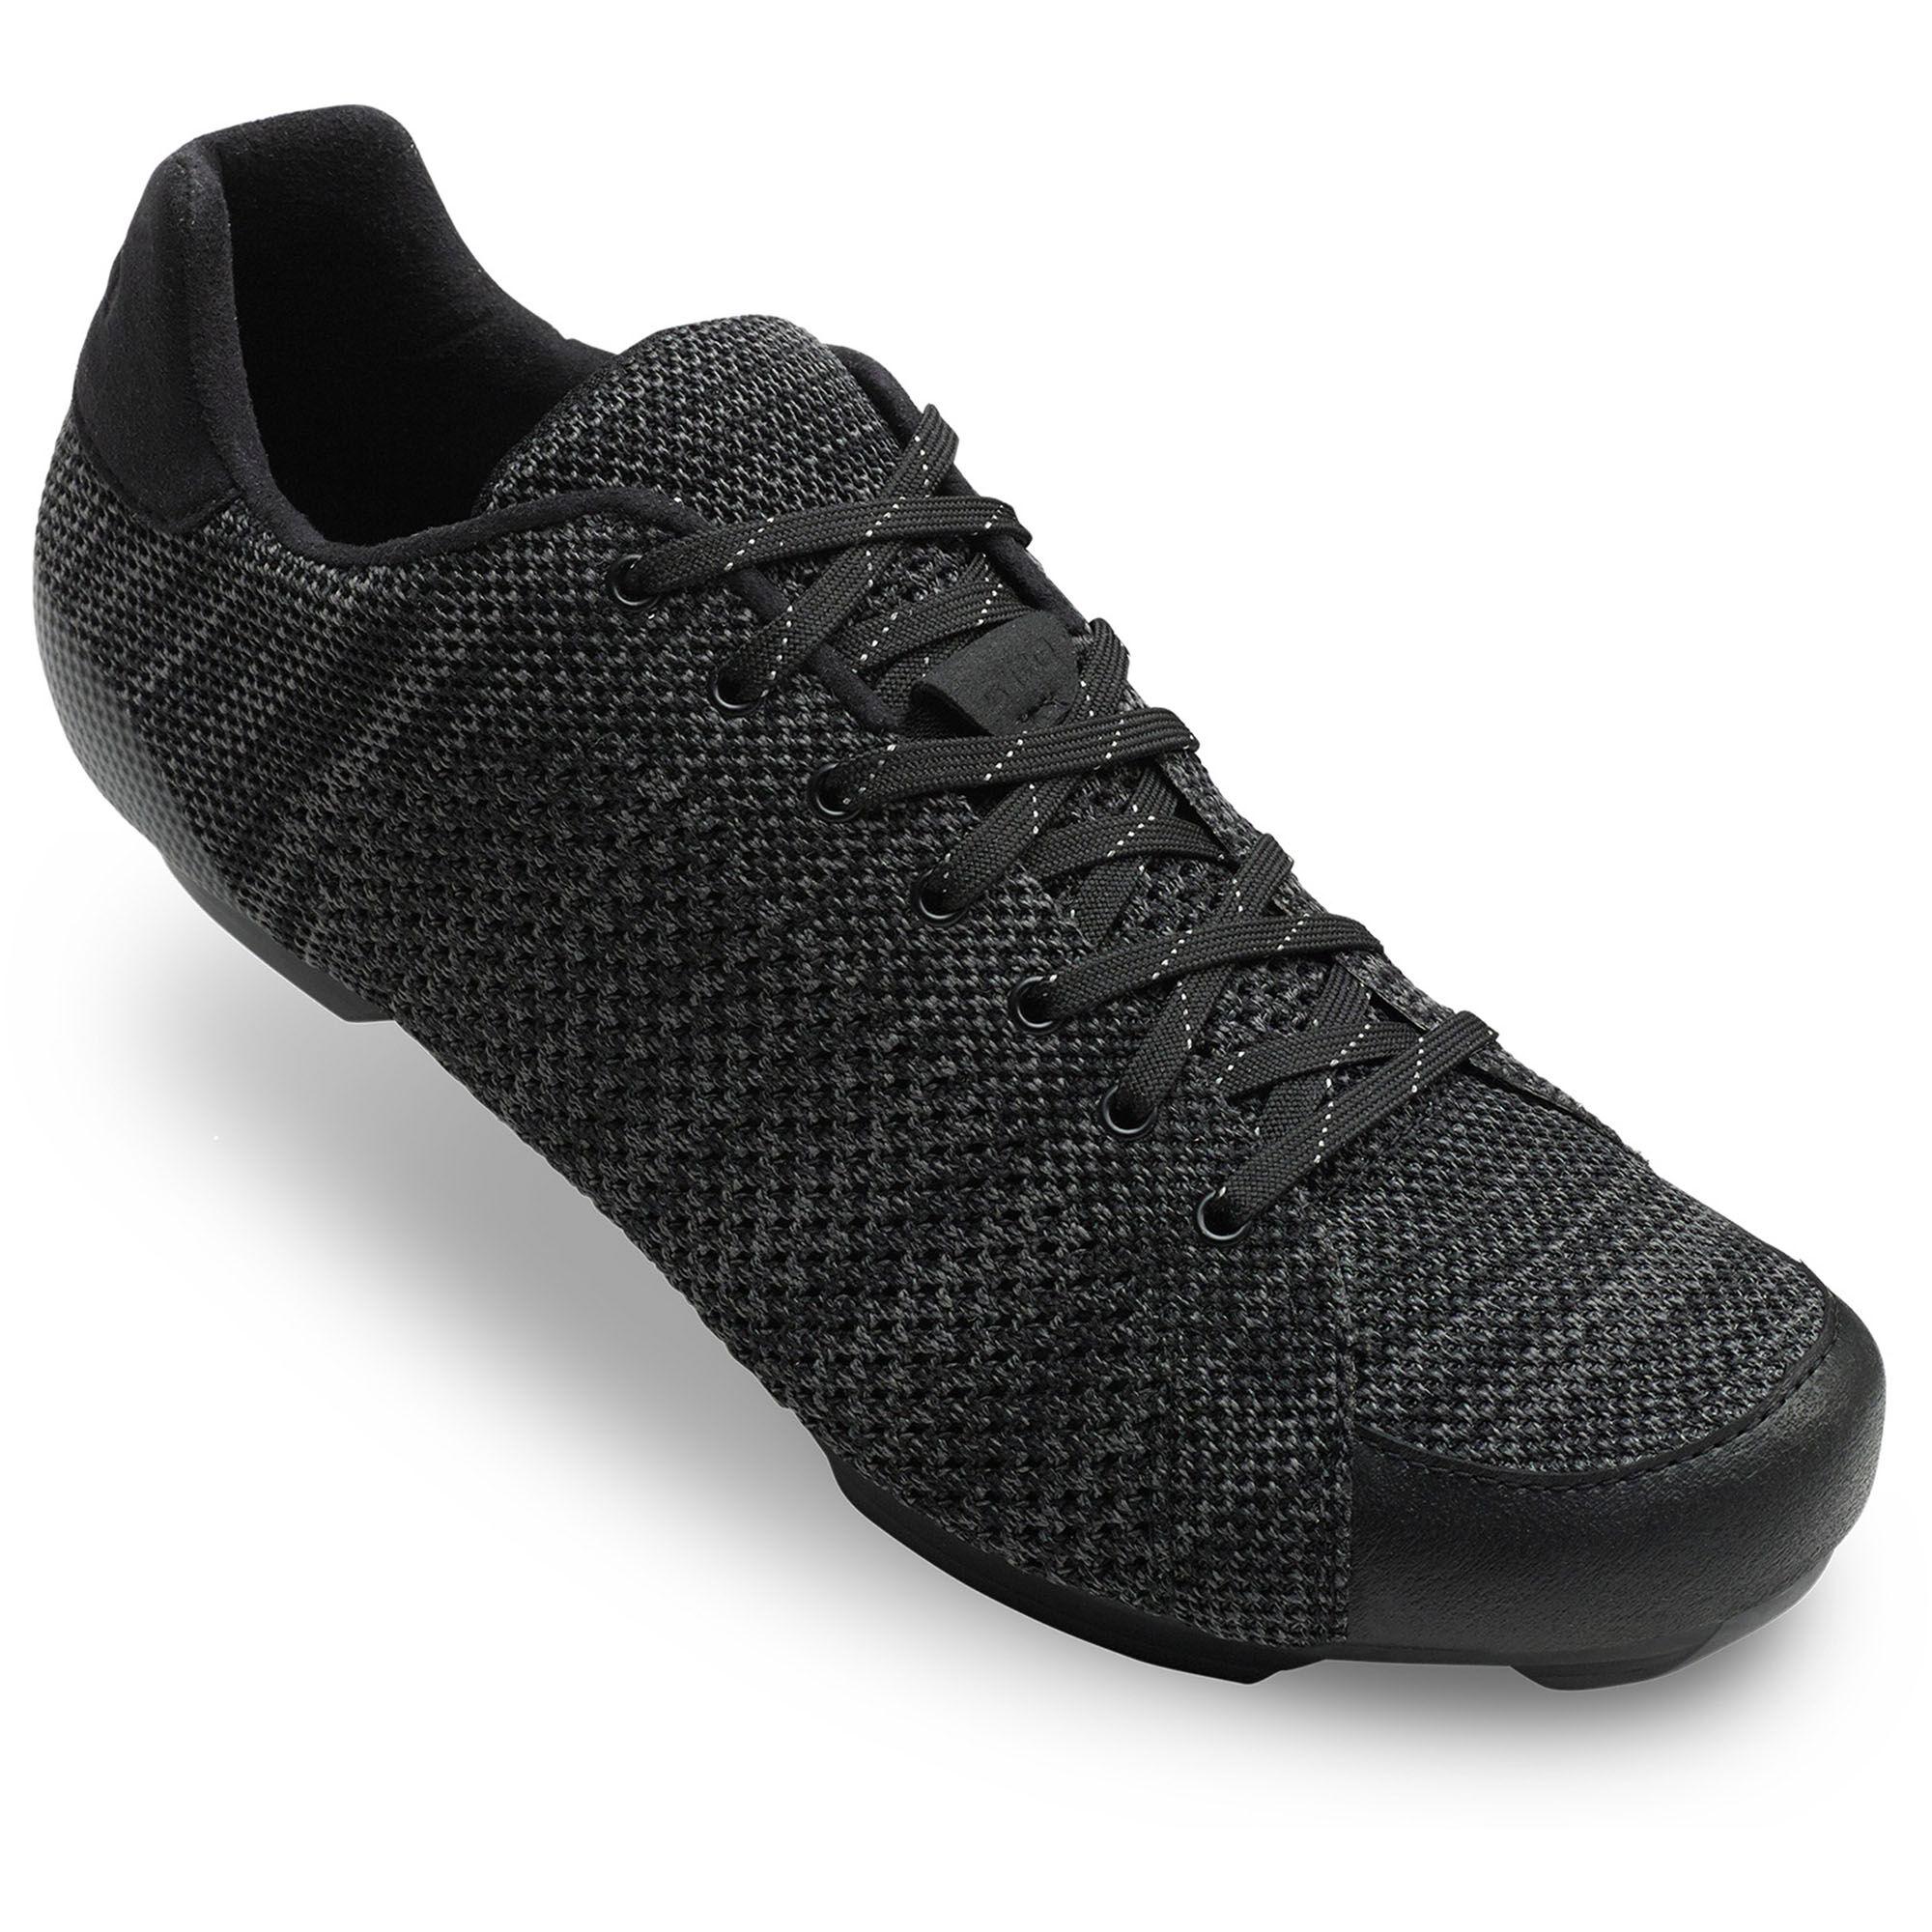 Giro Men's Republic R Knit Road Cycling Shoes  - Midnight/Blue Heather - Size: 39